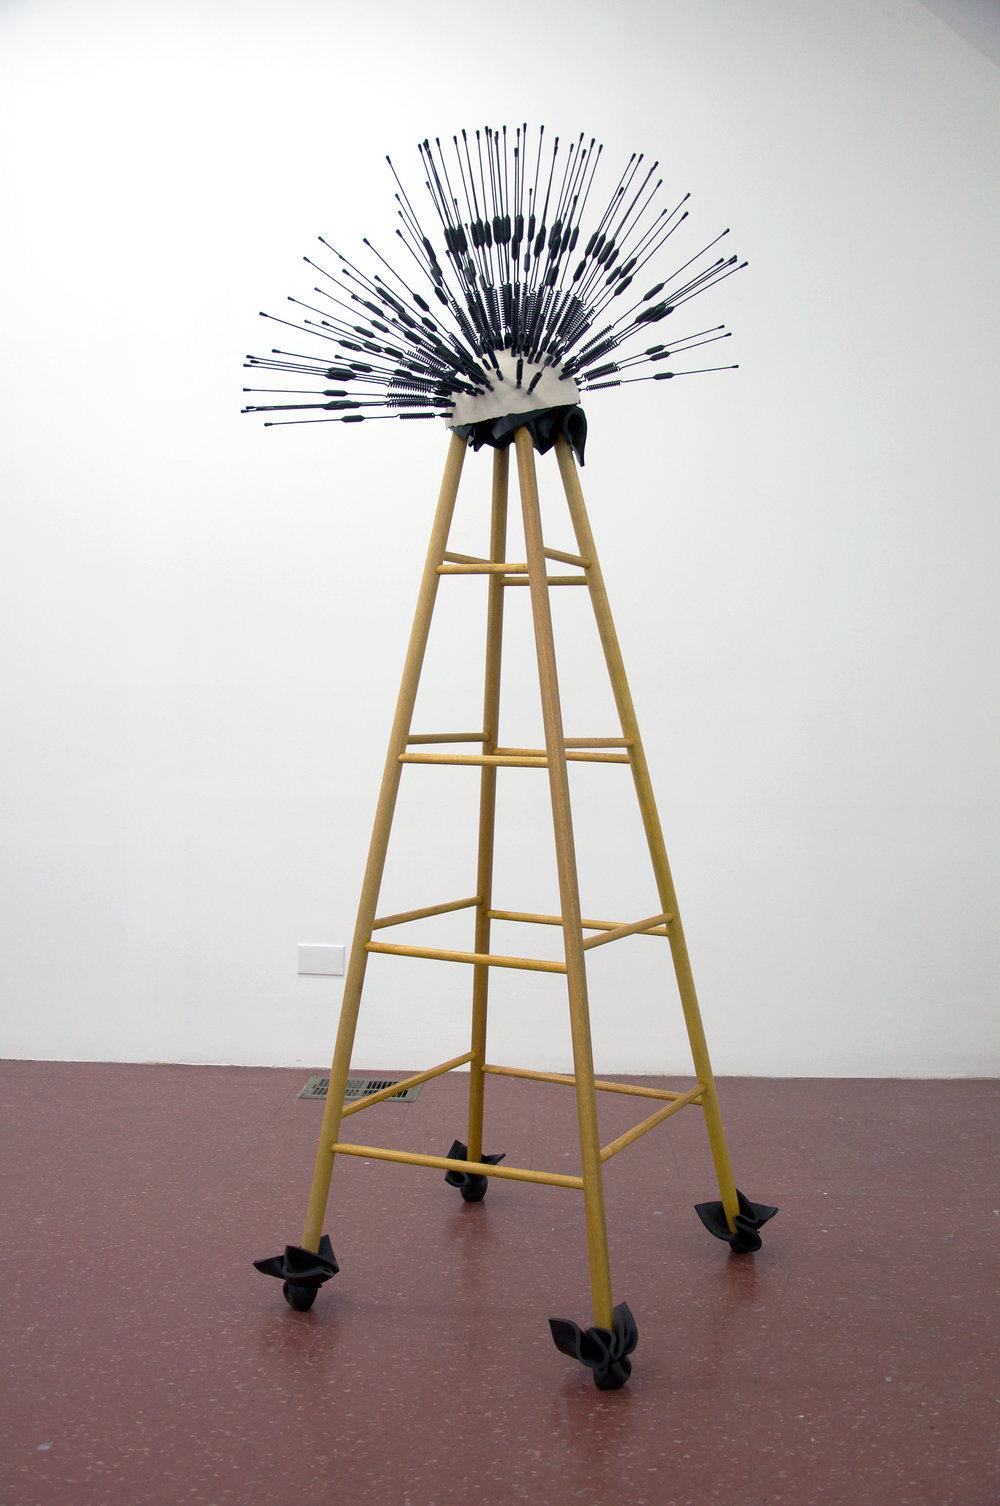 The New Wardenclyffe Folly, 2017 cellular antennas, porcelain, wood, foam